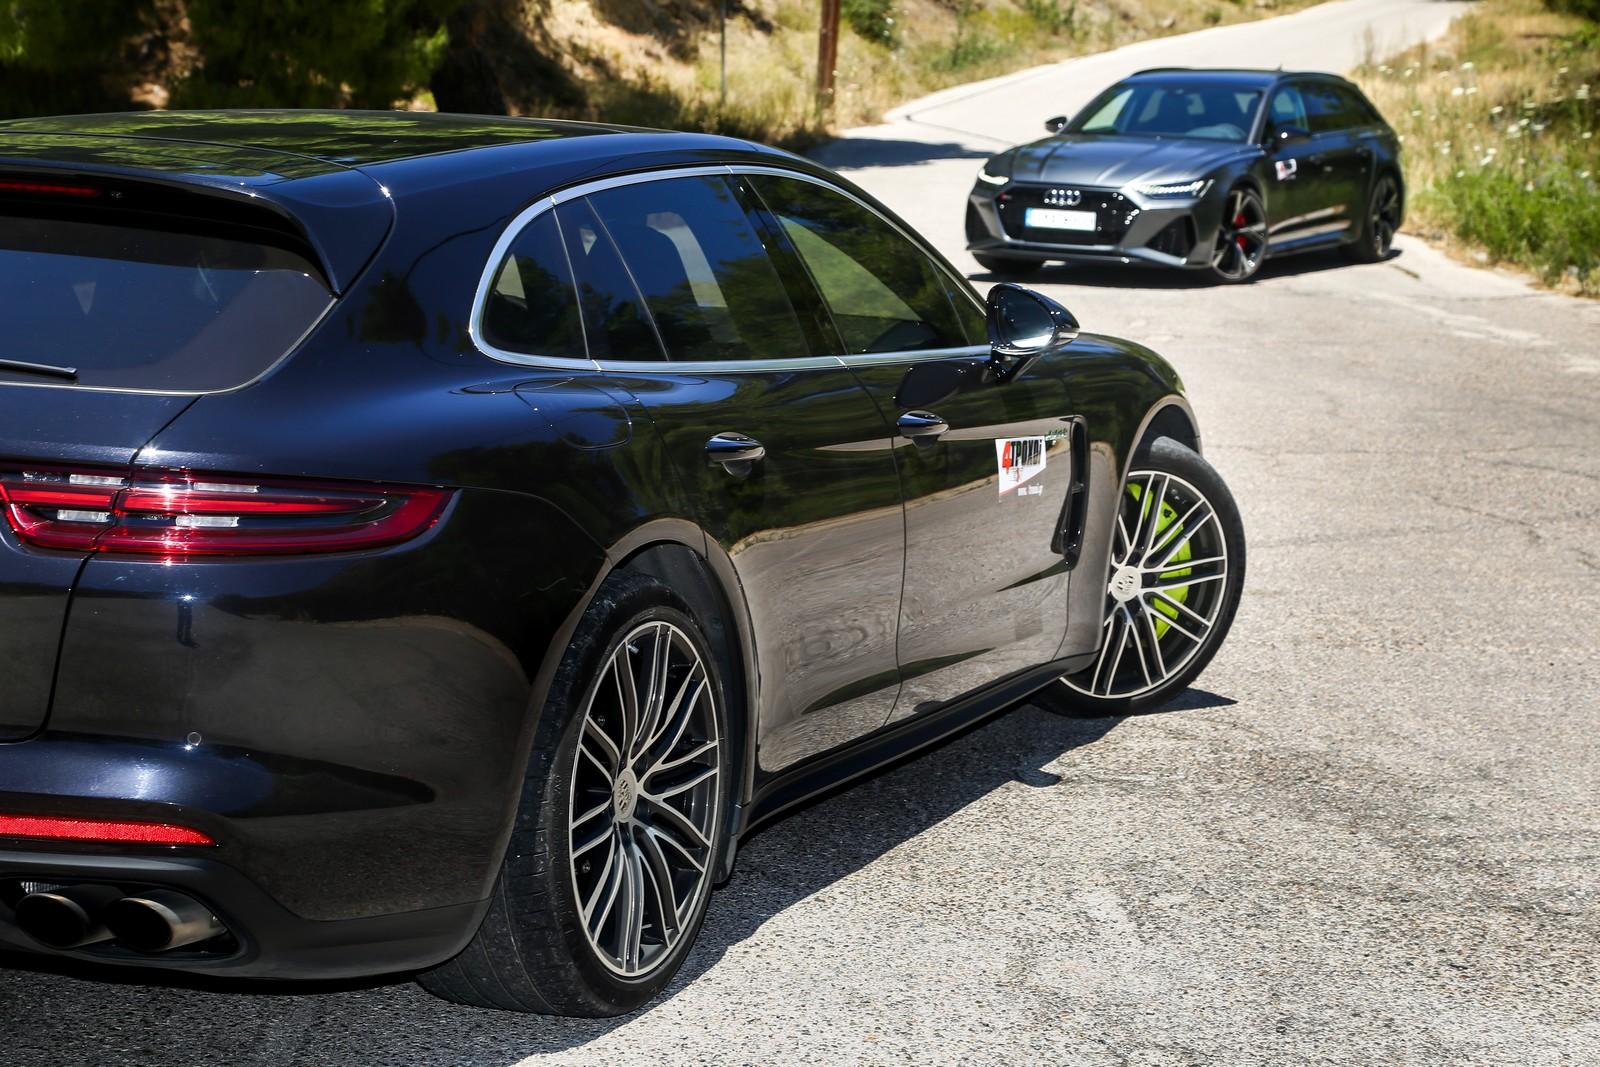 Audi RS 6 & Porsche Panamera S E-Hybrid Sport Turismo